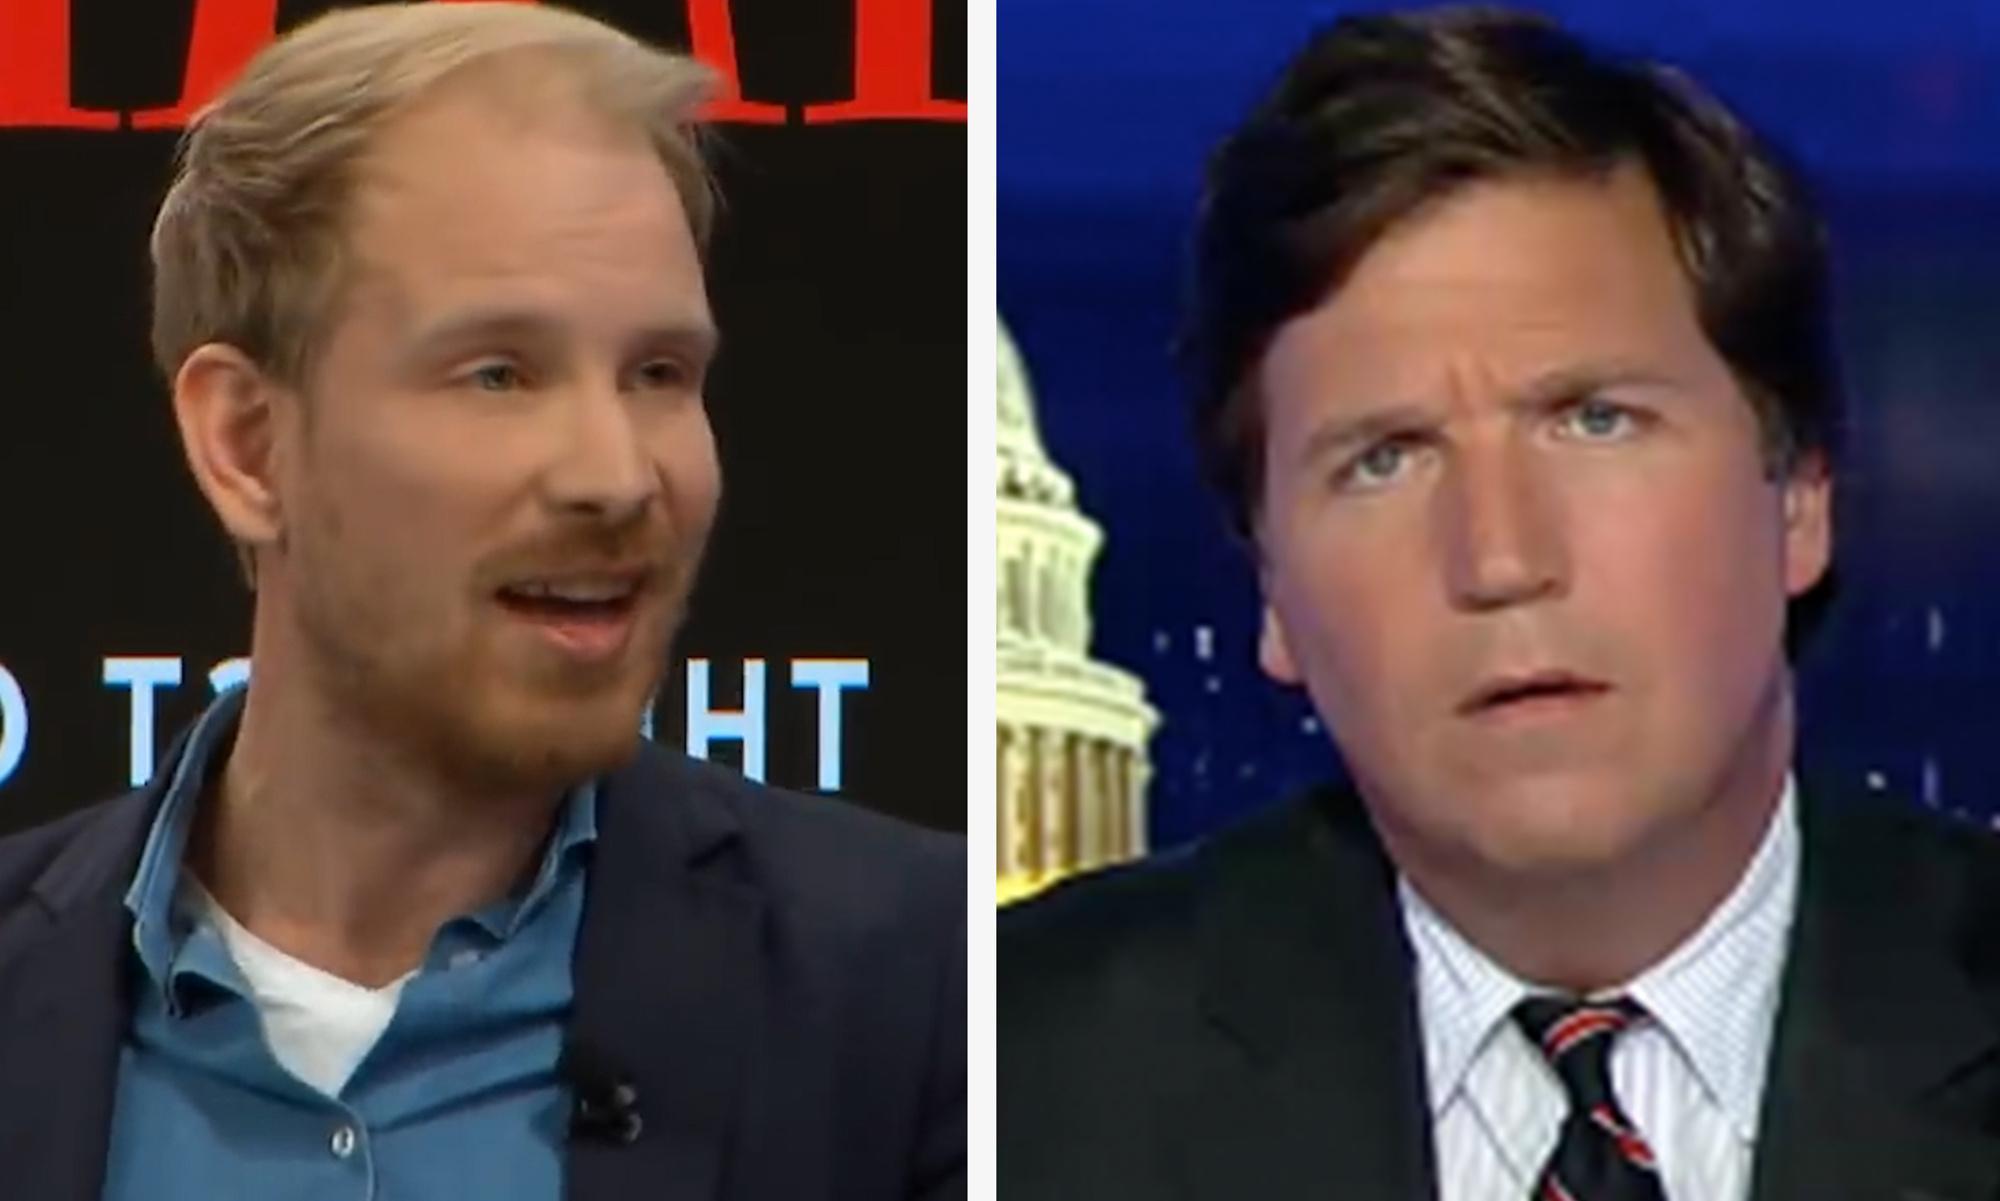 Historian who confronted Davos billionaires leaks Tucker Carlson rant